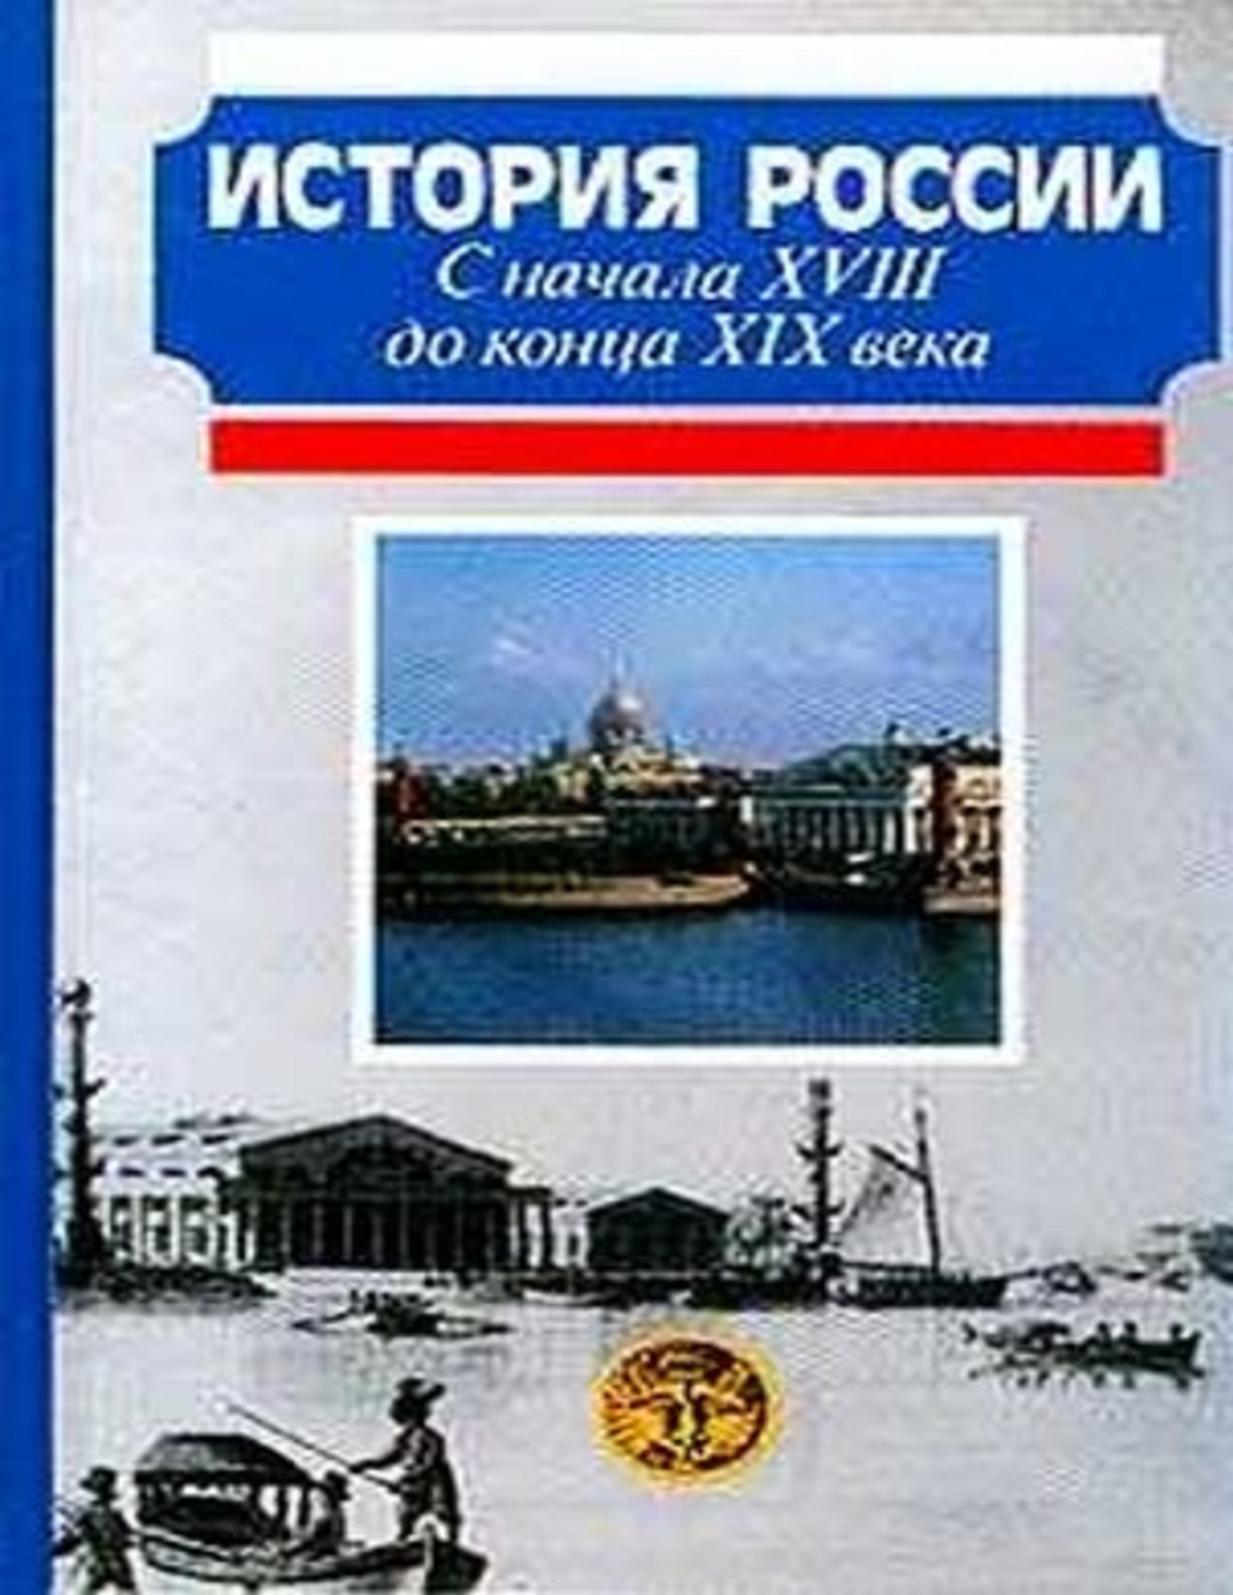 Хованщина (опера) — википедия